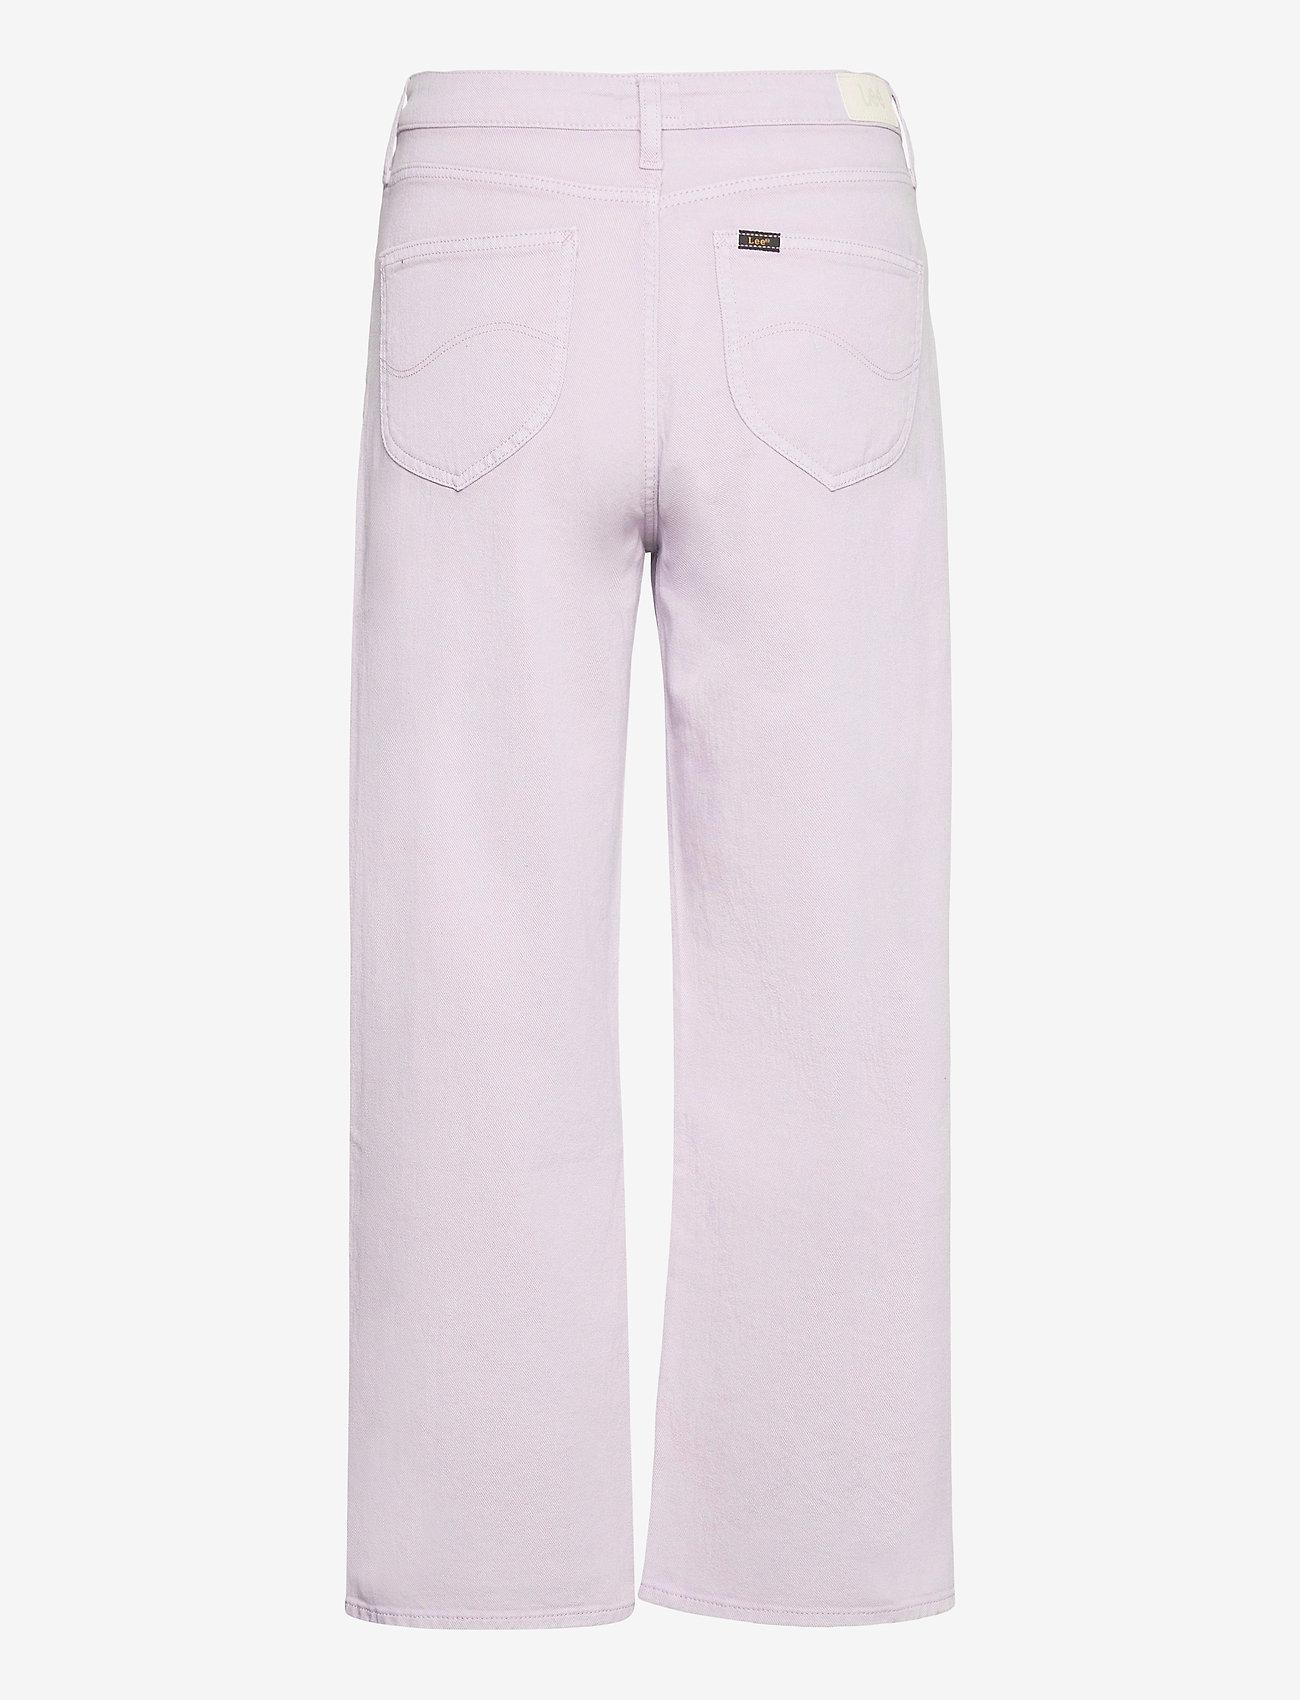 Lee Jeans - WIDE LEG - brede jeans - lilac - 1